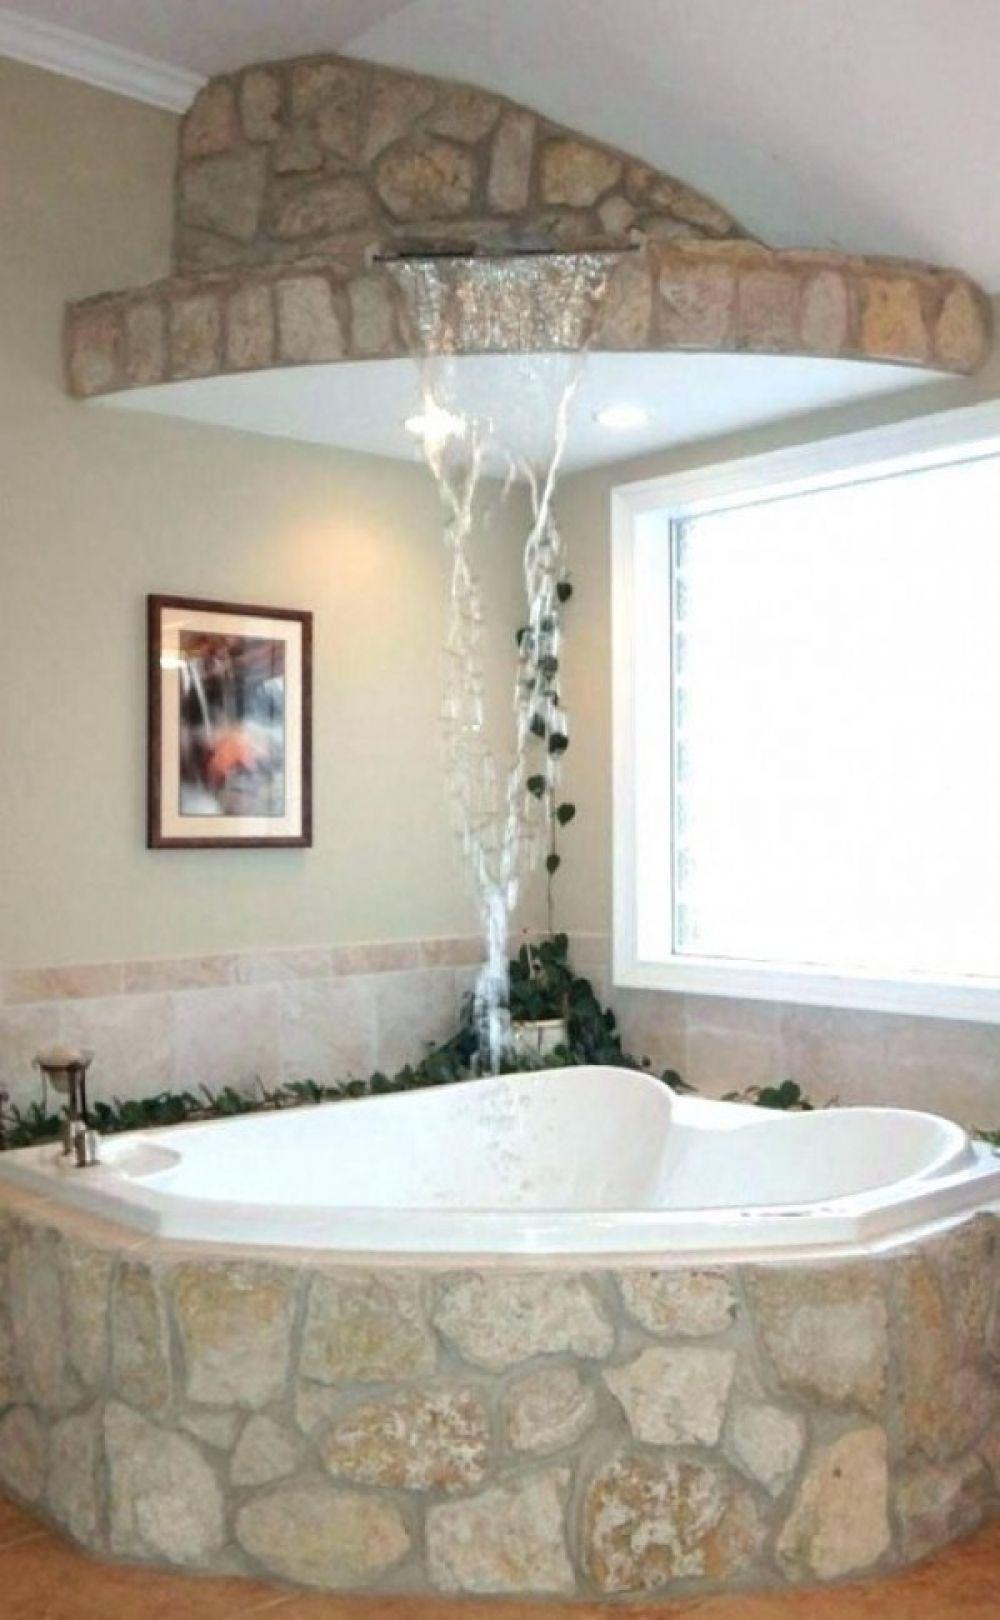 30 Small Bathroom Tub Shower Combo Ideas In 2020 Corner Jacuzzi